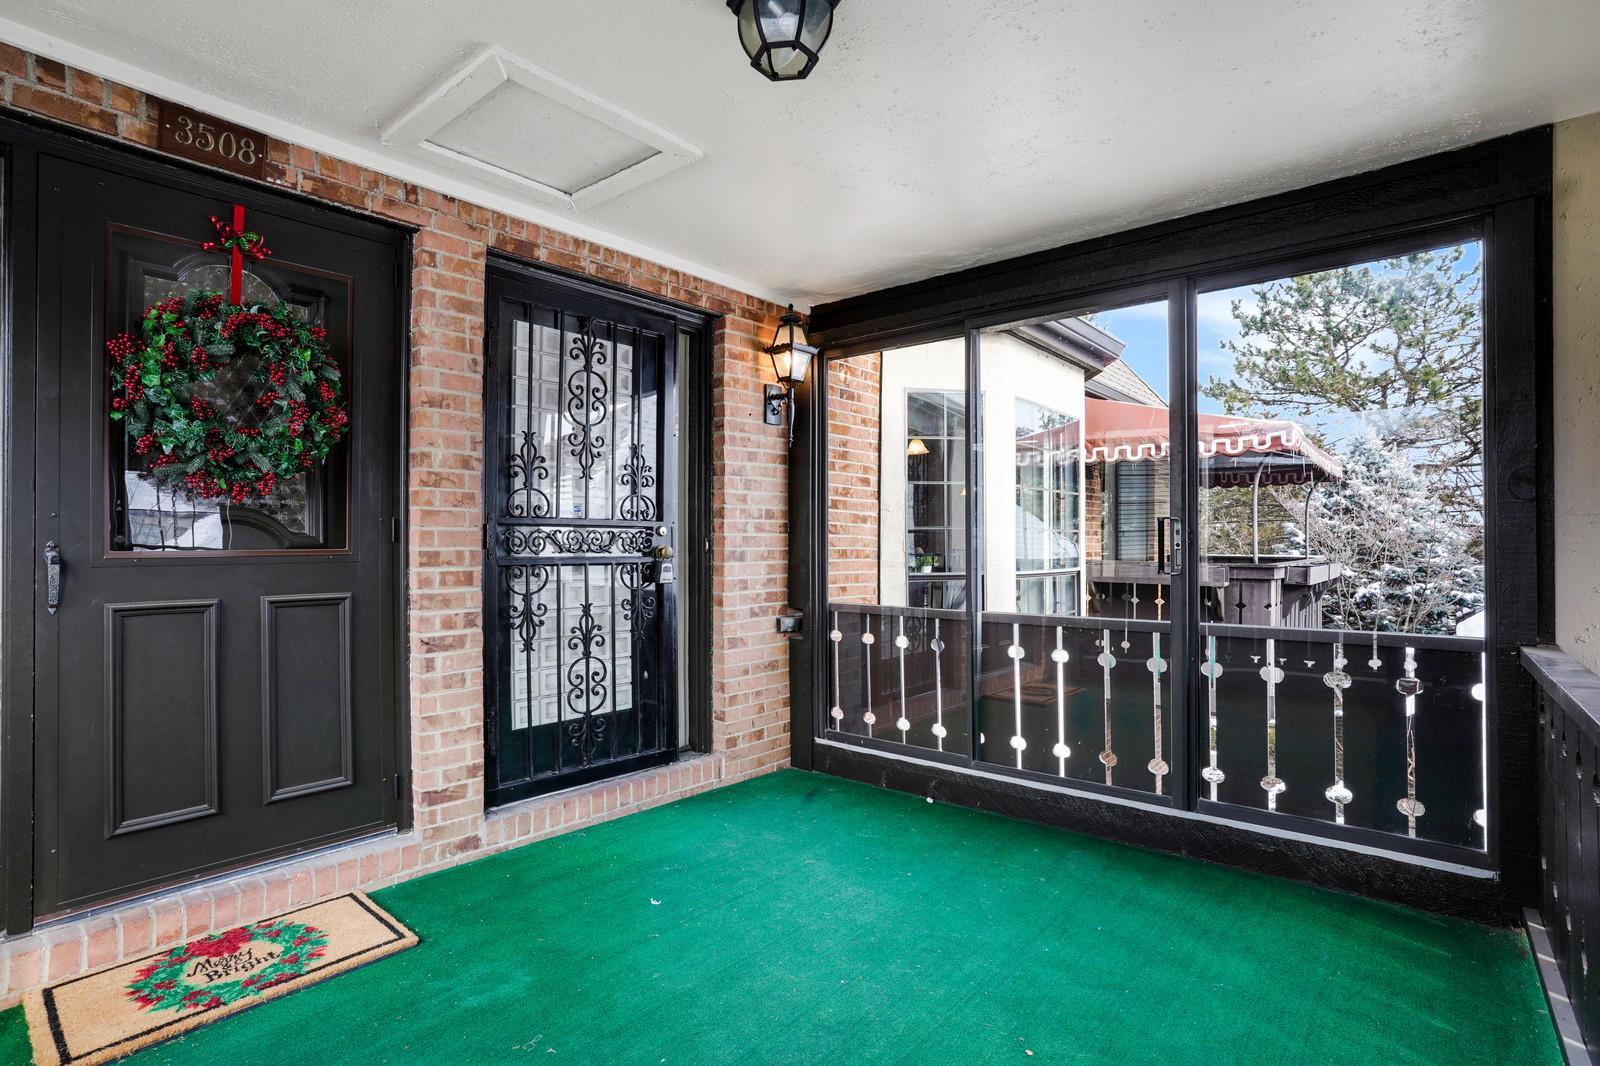 3502 La Rochelle Drive, Upper Arlington, Ohio 43221, 2 Bedrooms Bedrooms, ,3 BathroomsBathrooms,Residential,For Sale,La Rochelle,219045815